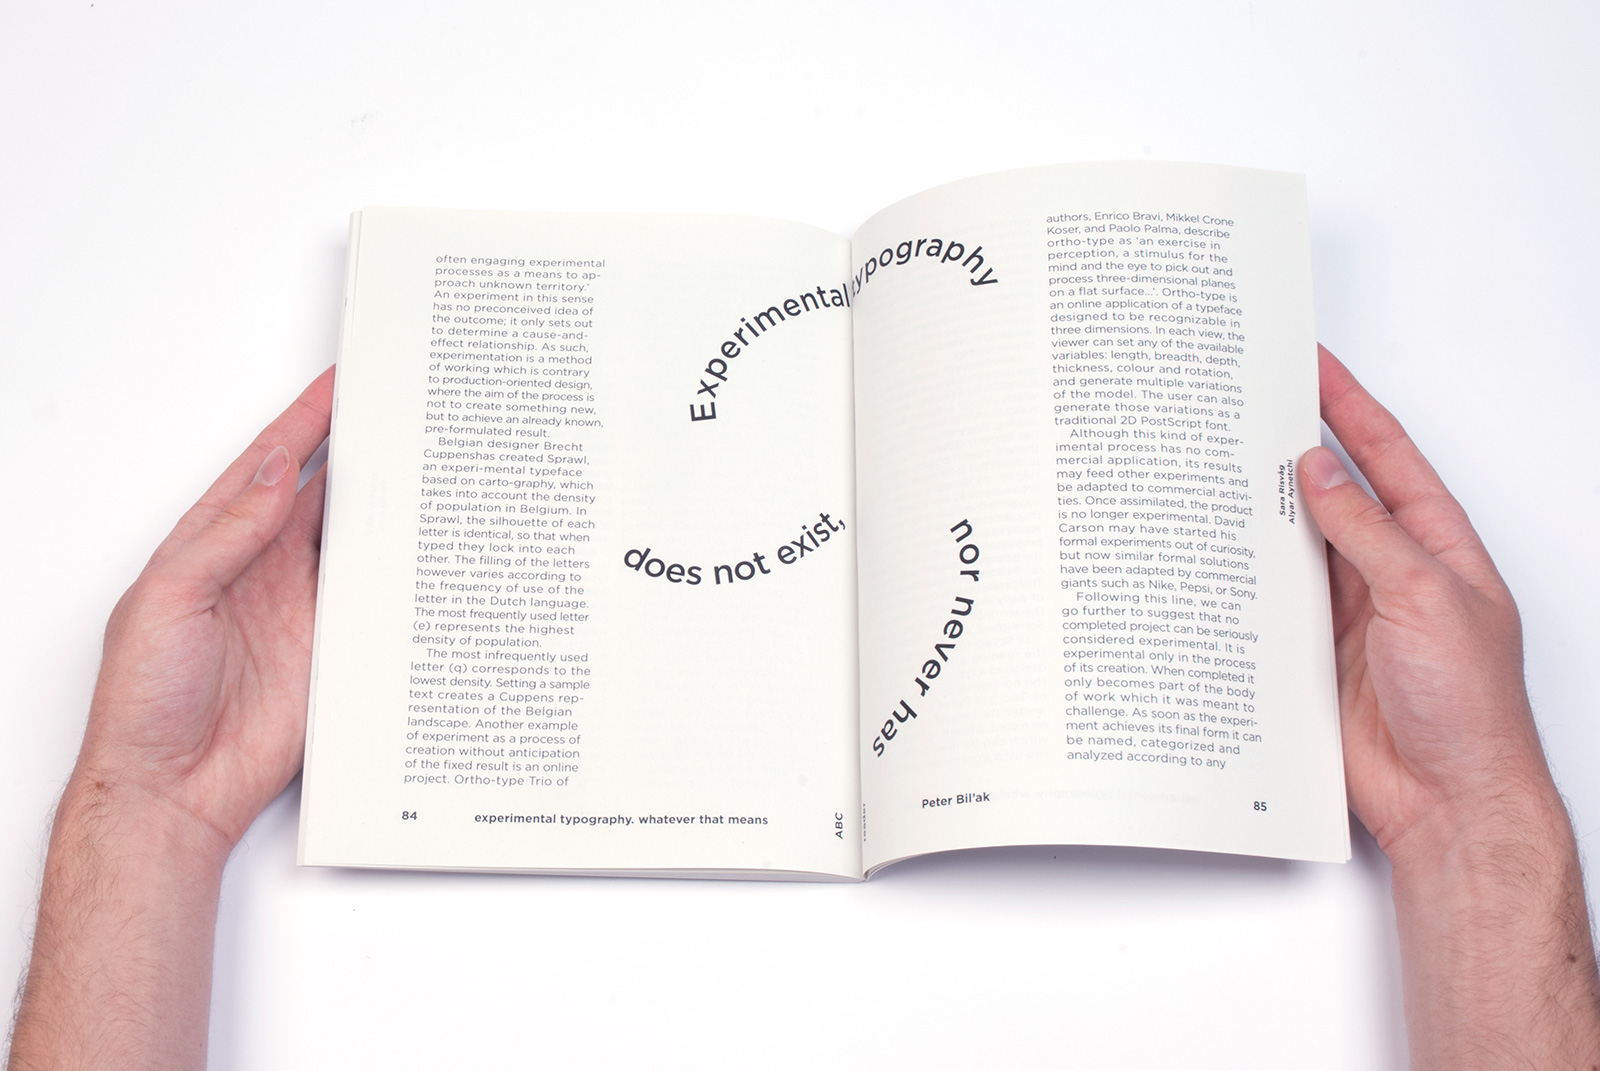 abc-typographic-reader-book-wilco-monen-09.jpg